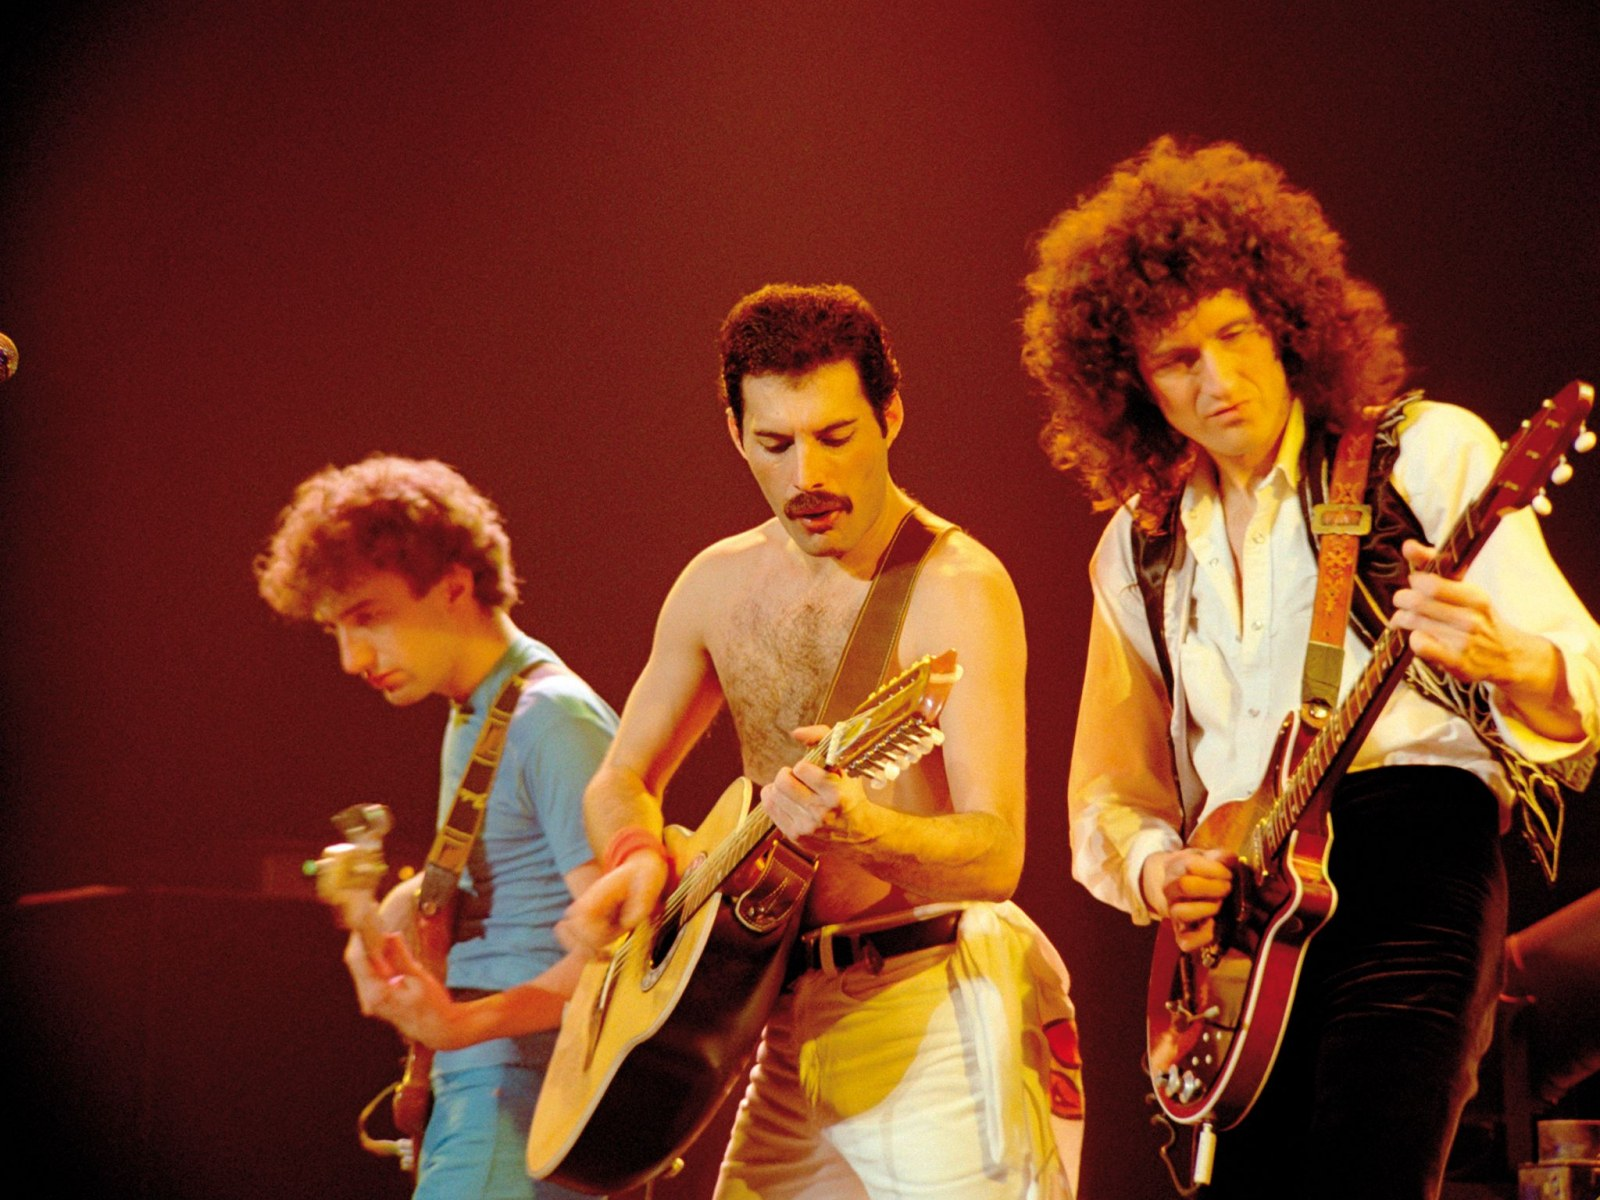 Queen's Brian May Will Rock You With 3-D book, Adam Lambert Tour